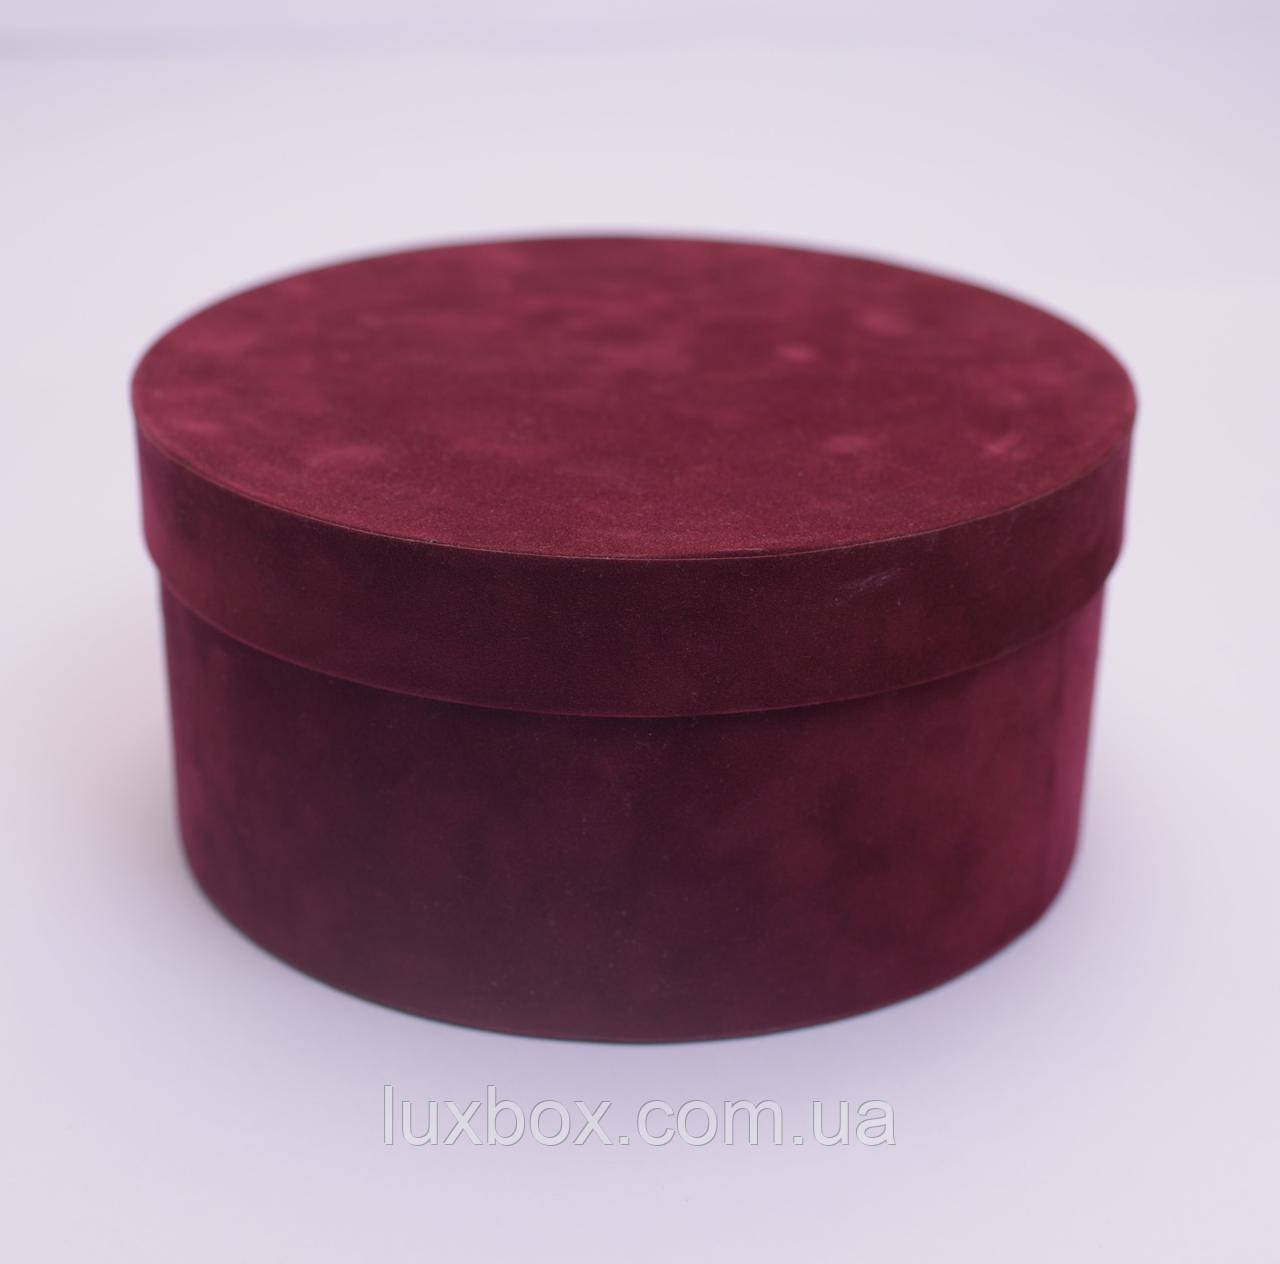 Шляпна коробка Велюрова(бархатна коробка) h11/d20